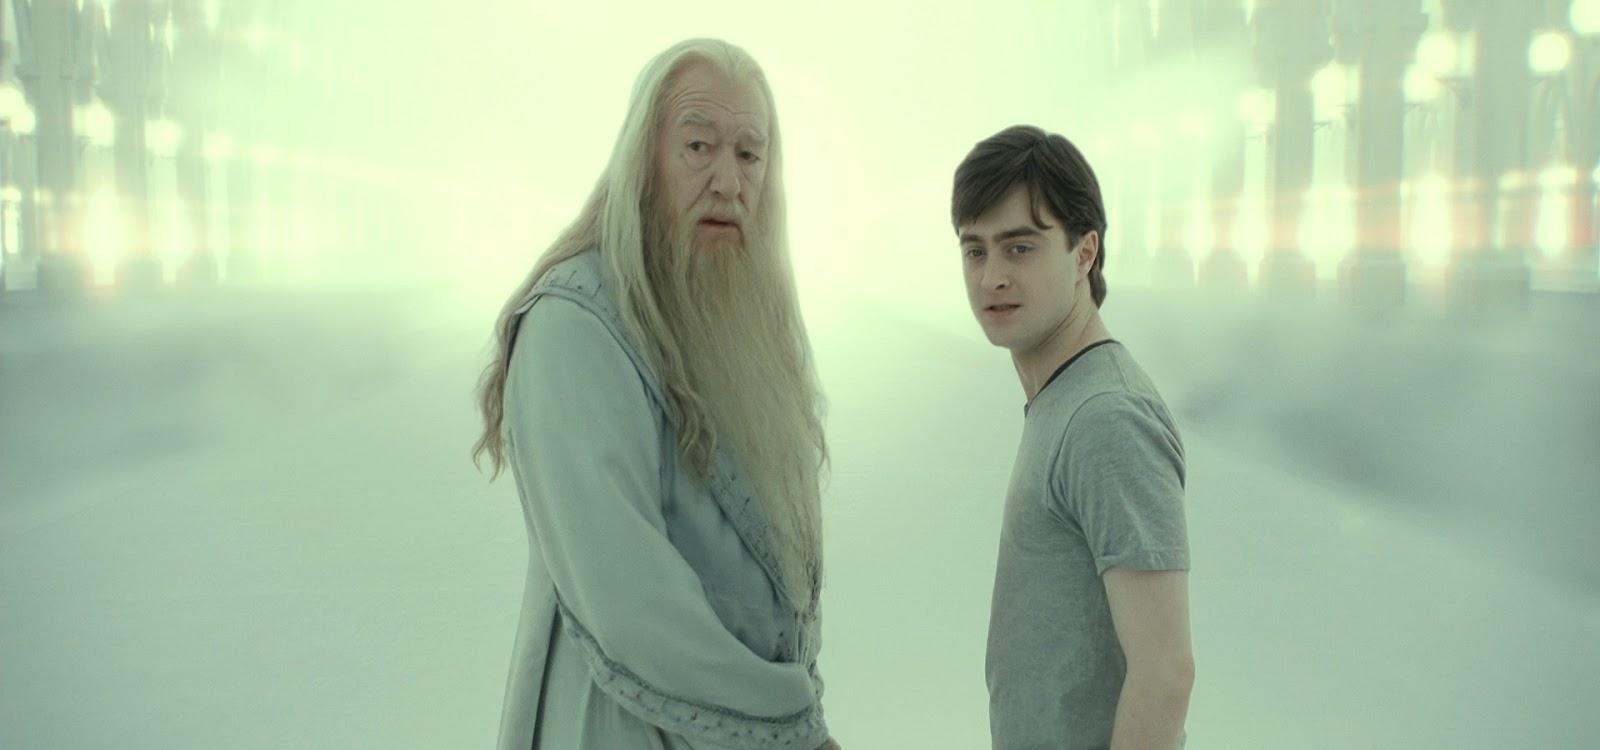 Harry Potter 7 Parte 2 HD 1080p Latino 60fps captura 3